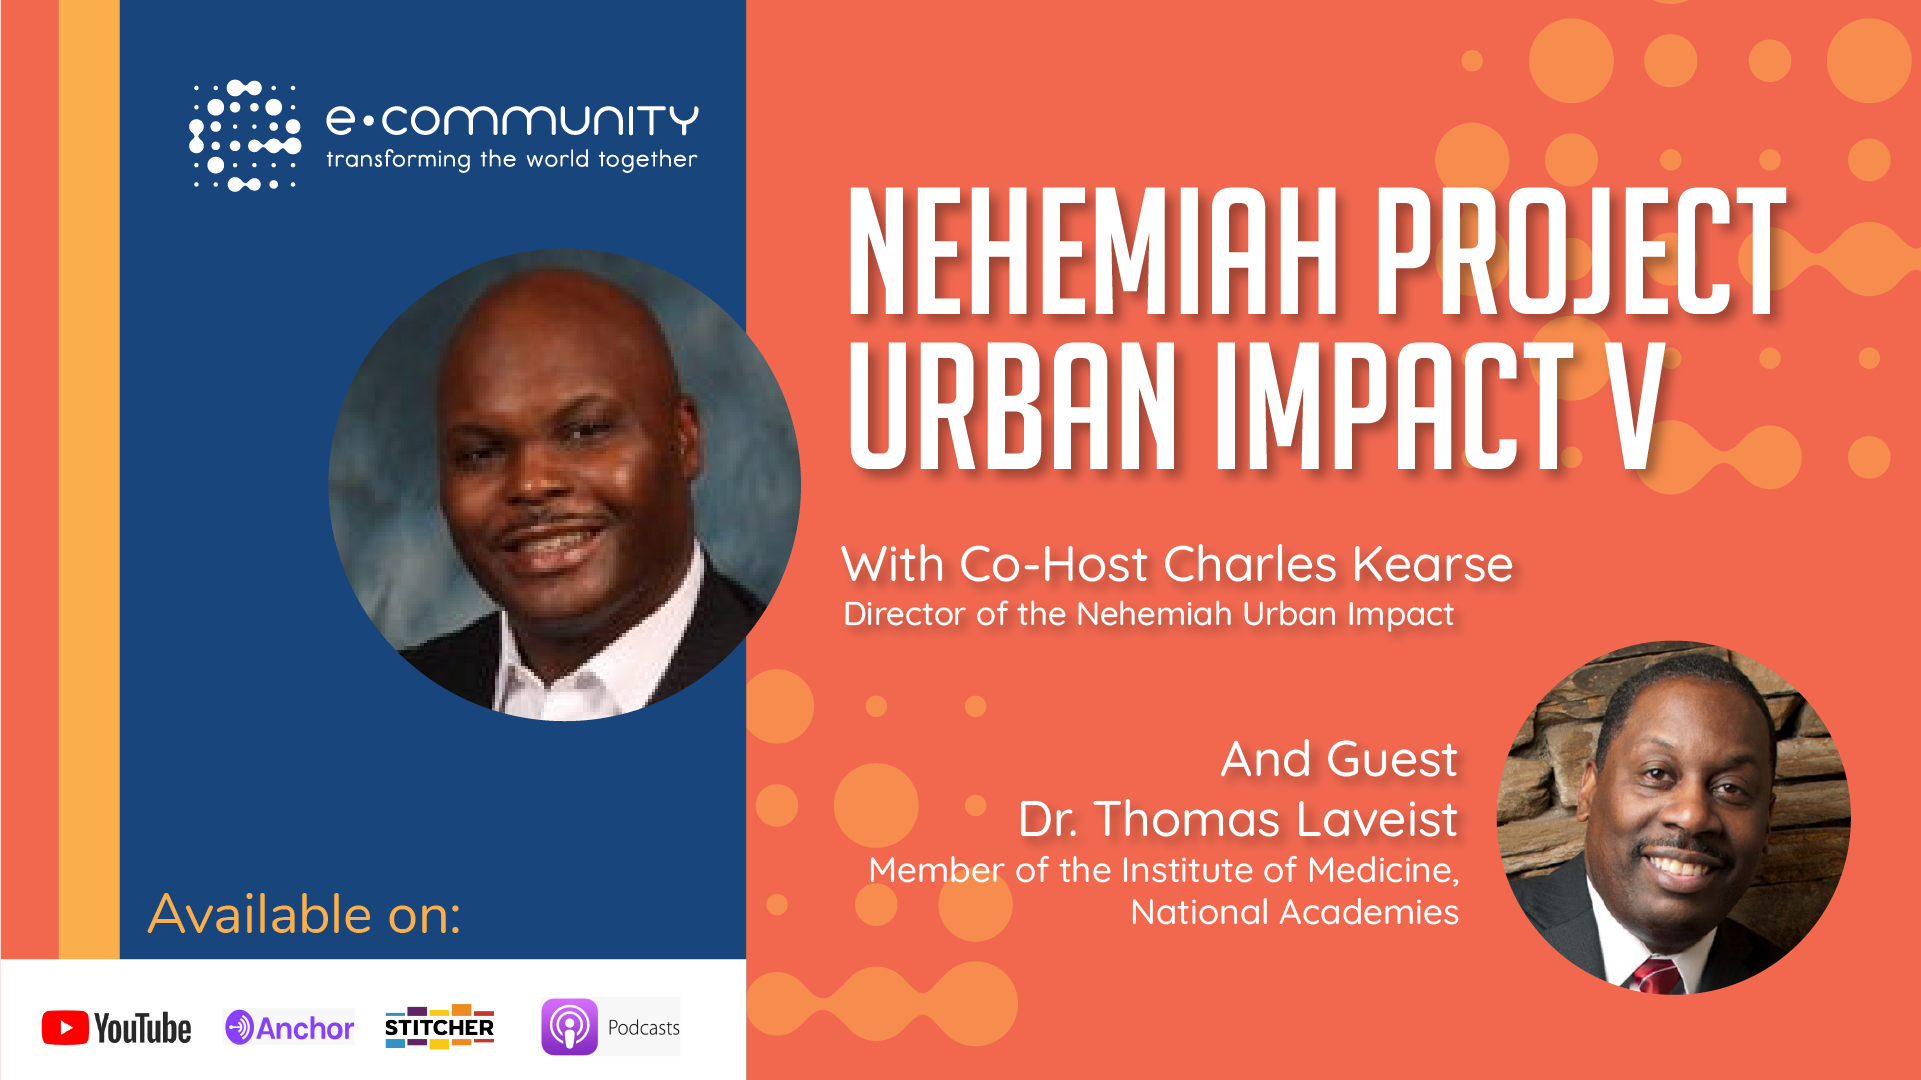 Nehemiah Project Urban Impact v